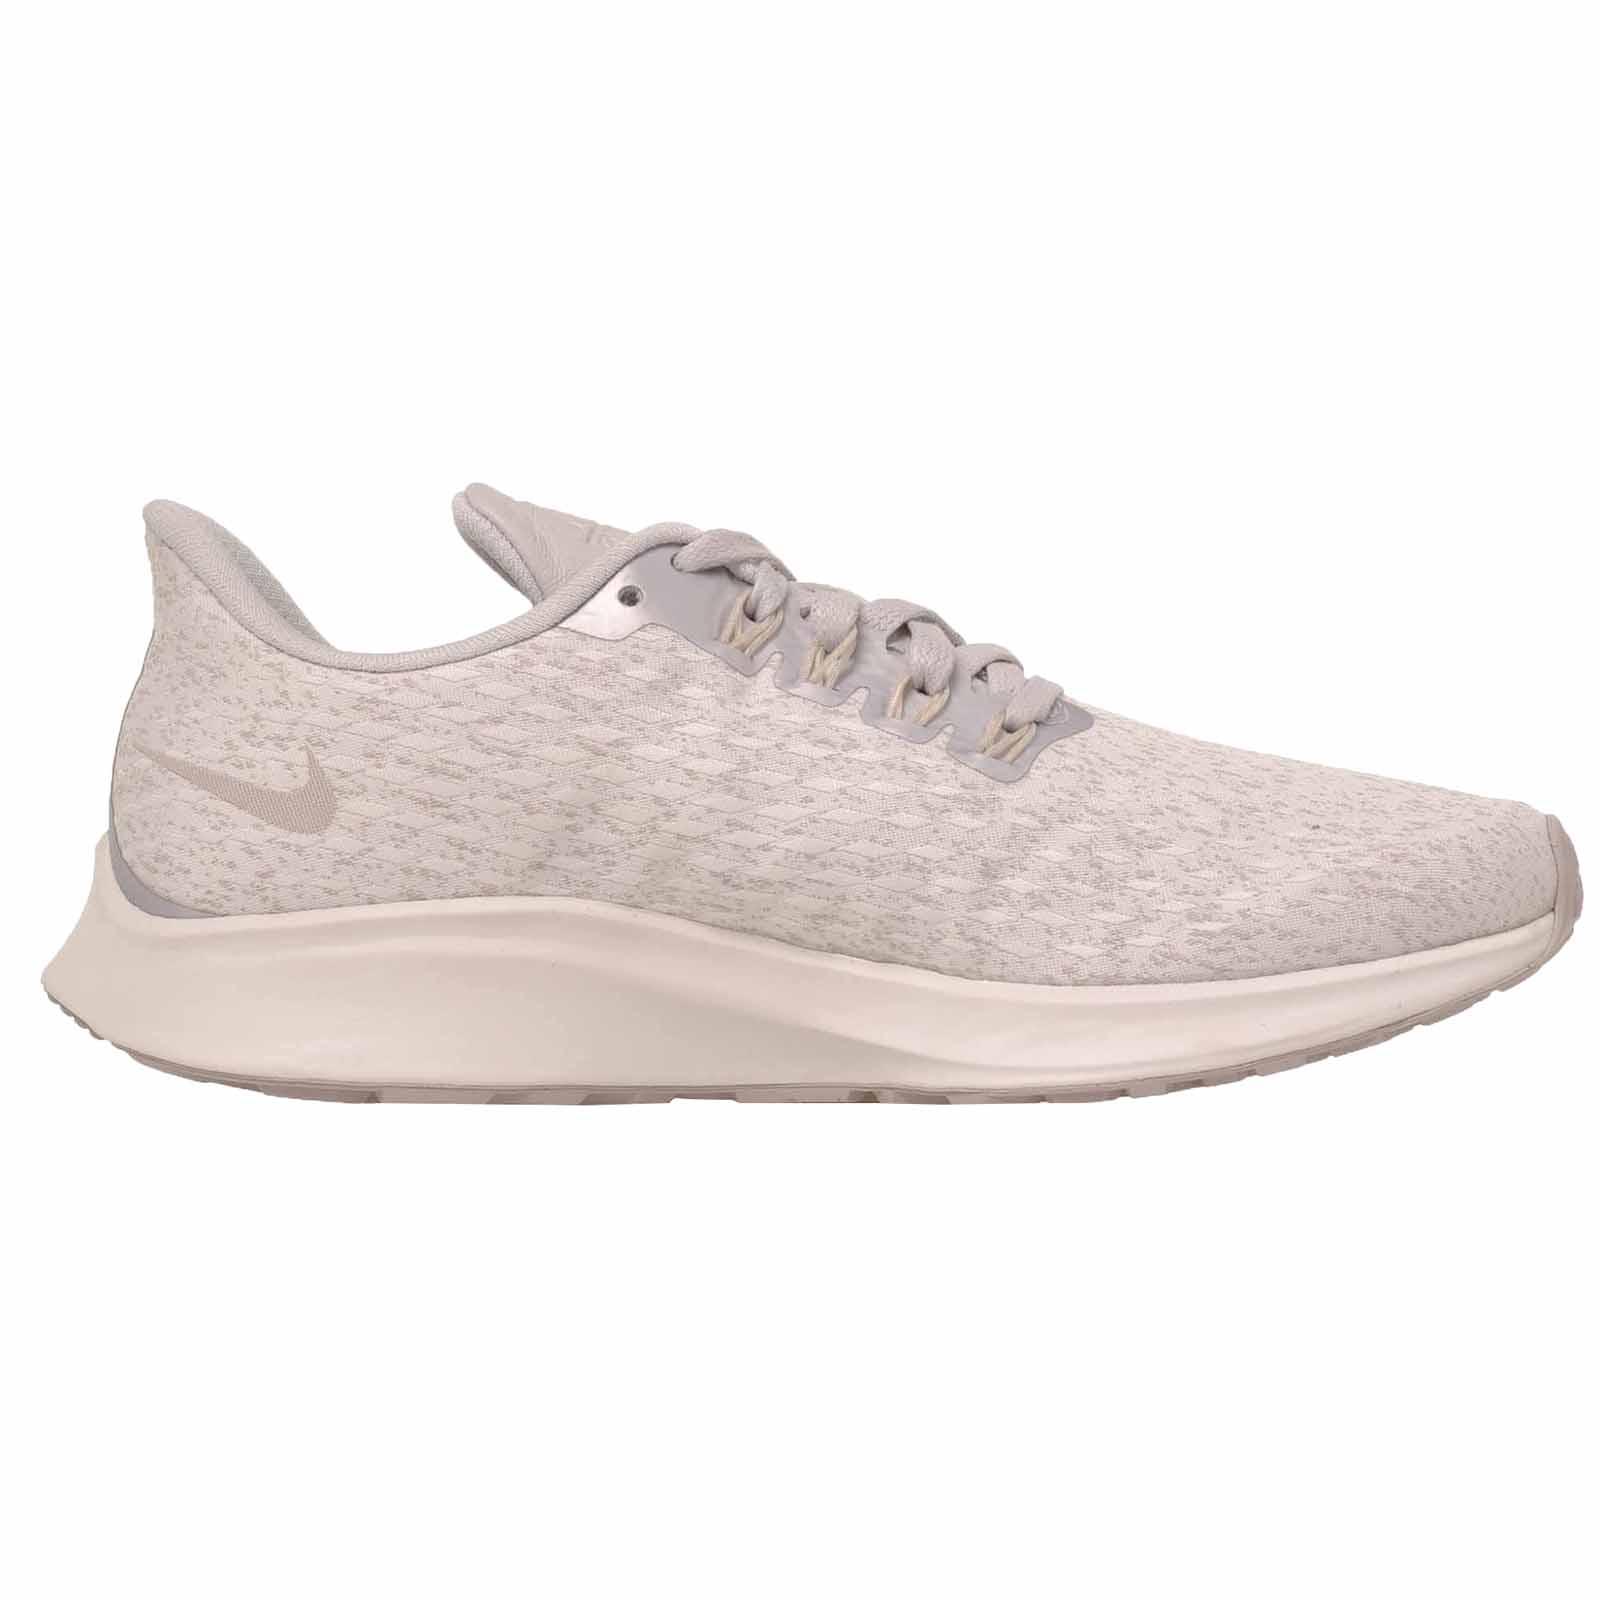 Details about Nike W Air Zoom Pegasus 35 PRM Running Womens Shoes Vast Grey AH8392 002